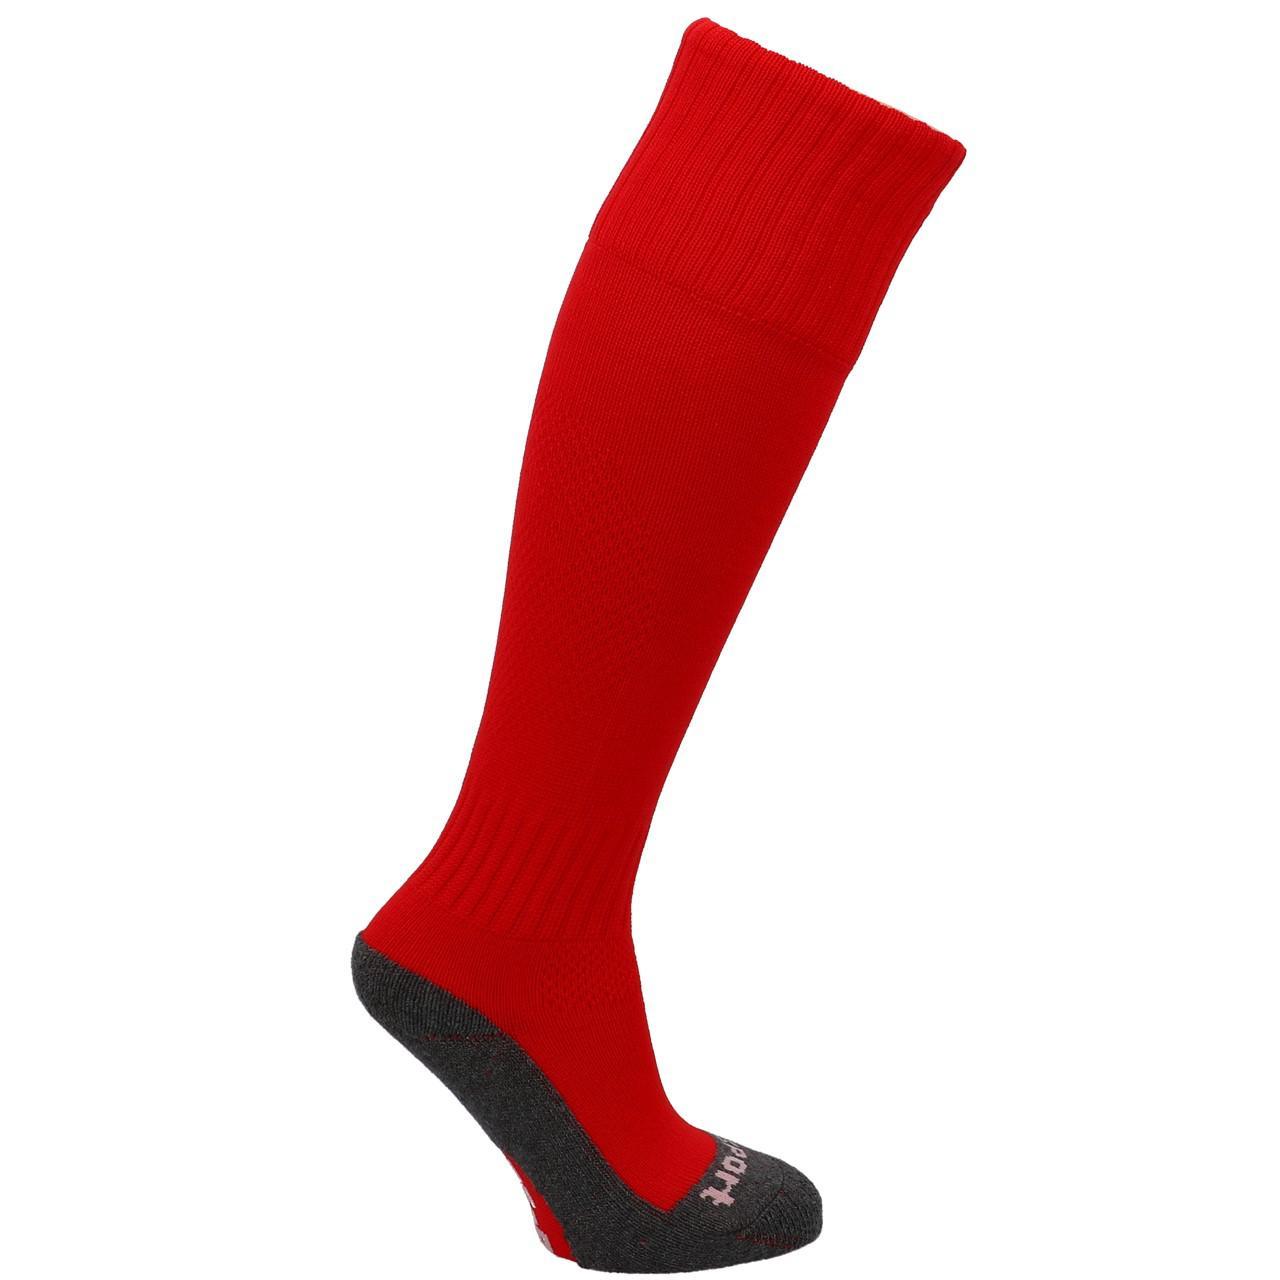 Socks-Football-Uhlsport-Team-pro-Ess-Red-Red-71122-New thumbnail 2